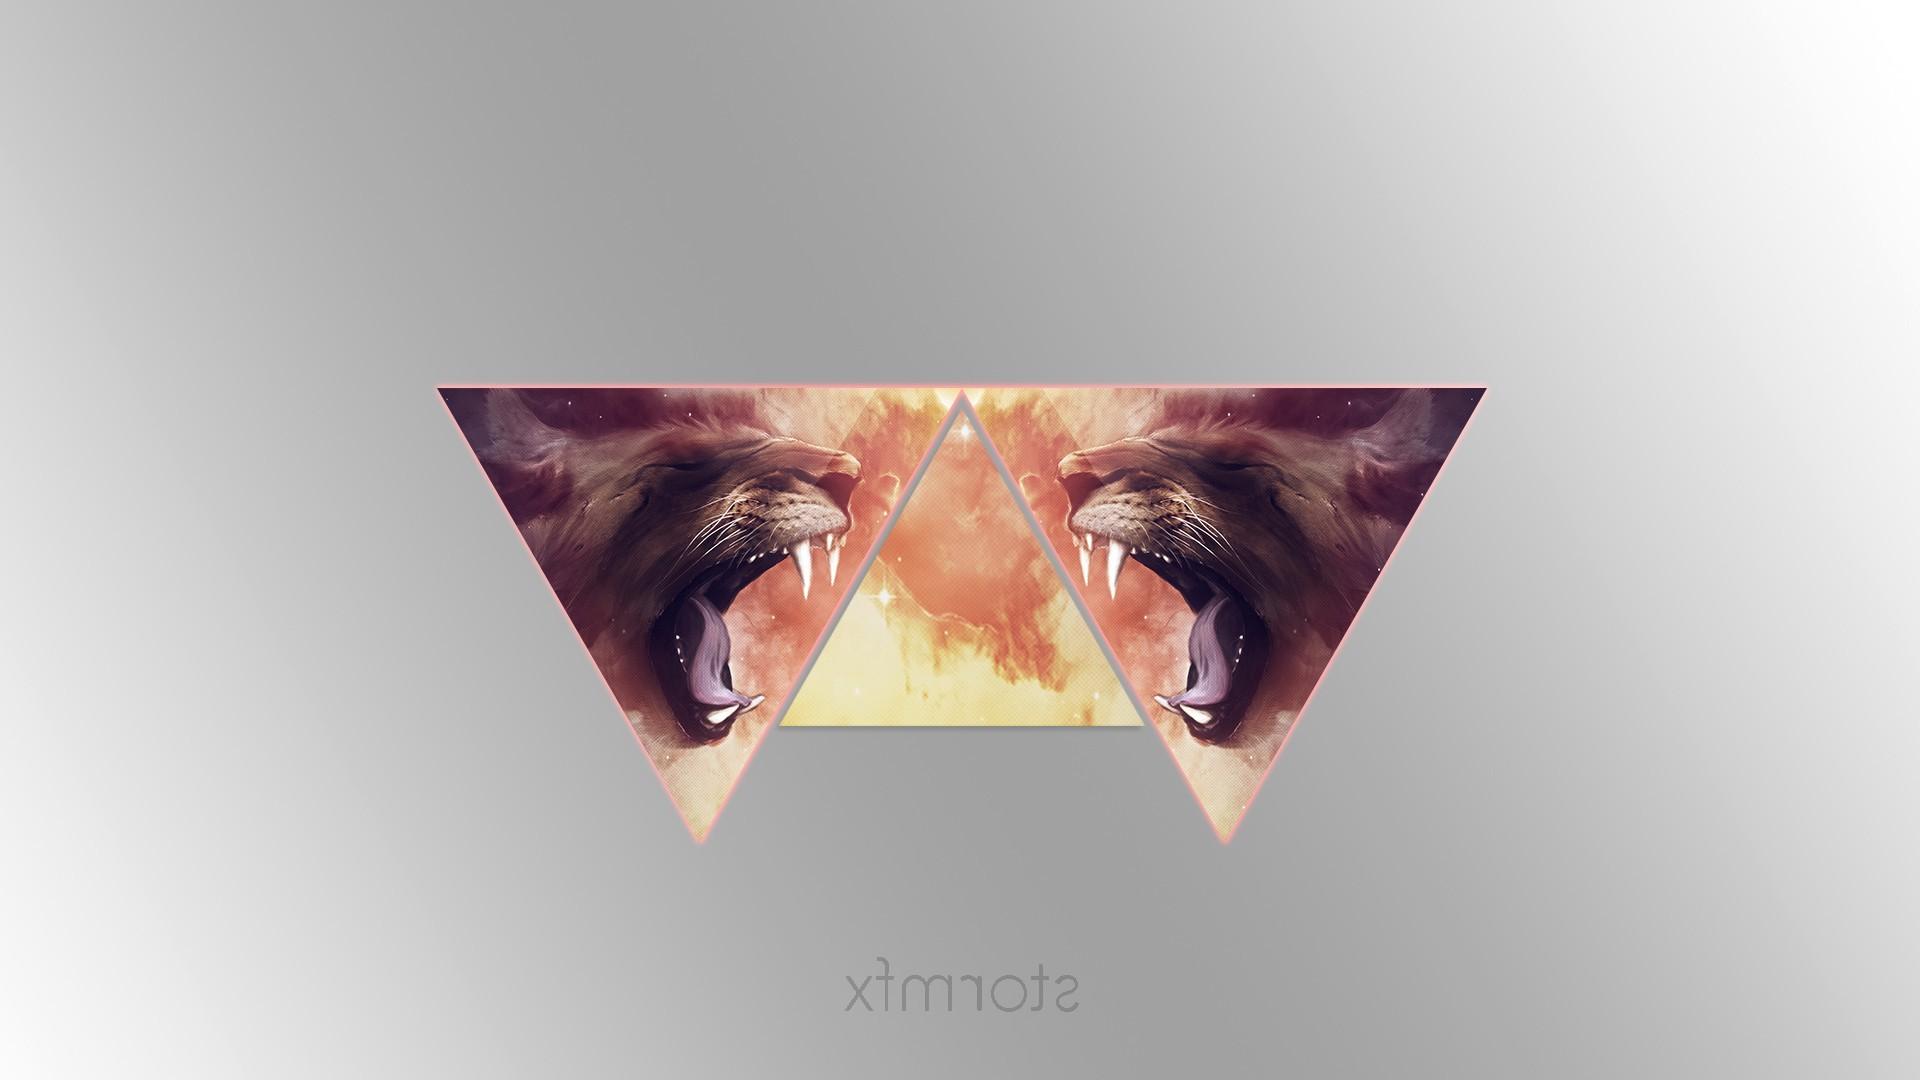 Illustration Galaxy Clouds Text Logo Lion Graphic Design Triangle Nose Brand Eye Advertising Sense 1920x1080 Px